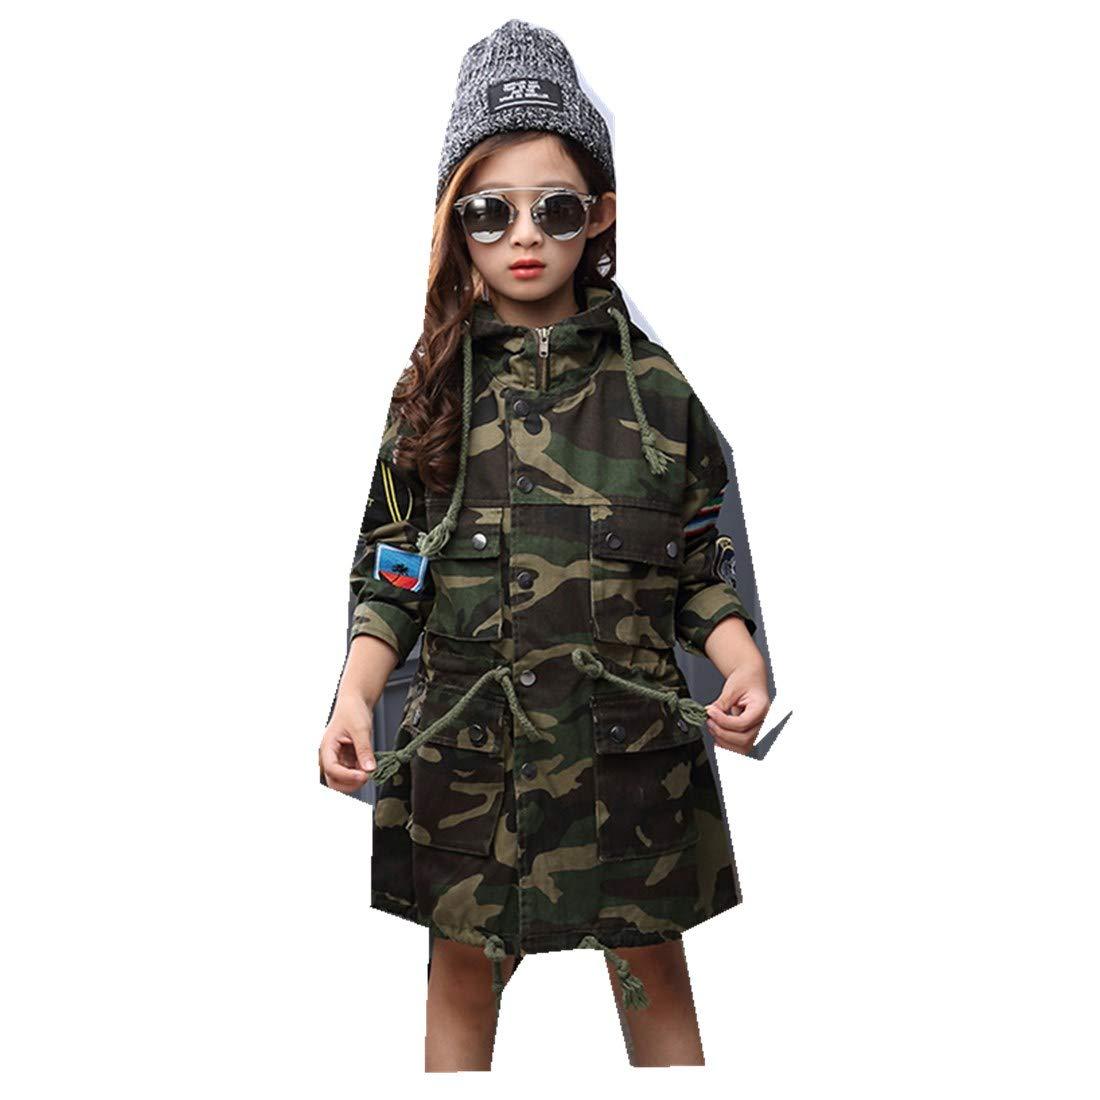 MV Spring Autumn Childrens Clothing Korean Waist Long Camouflage Clothing Outside